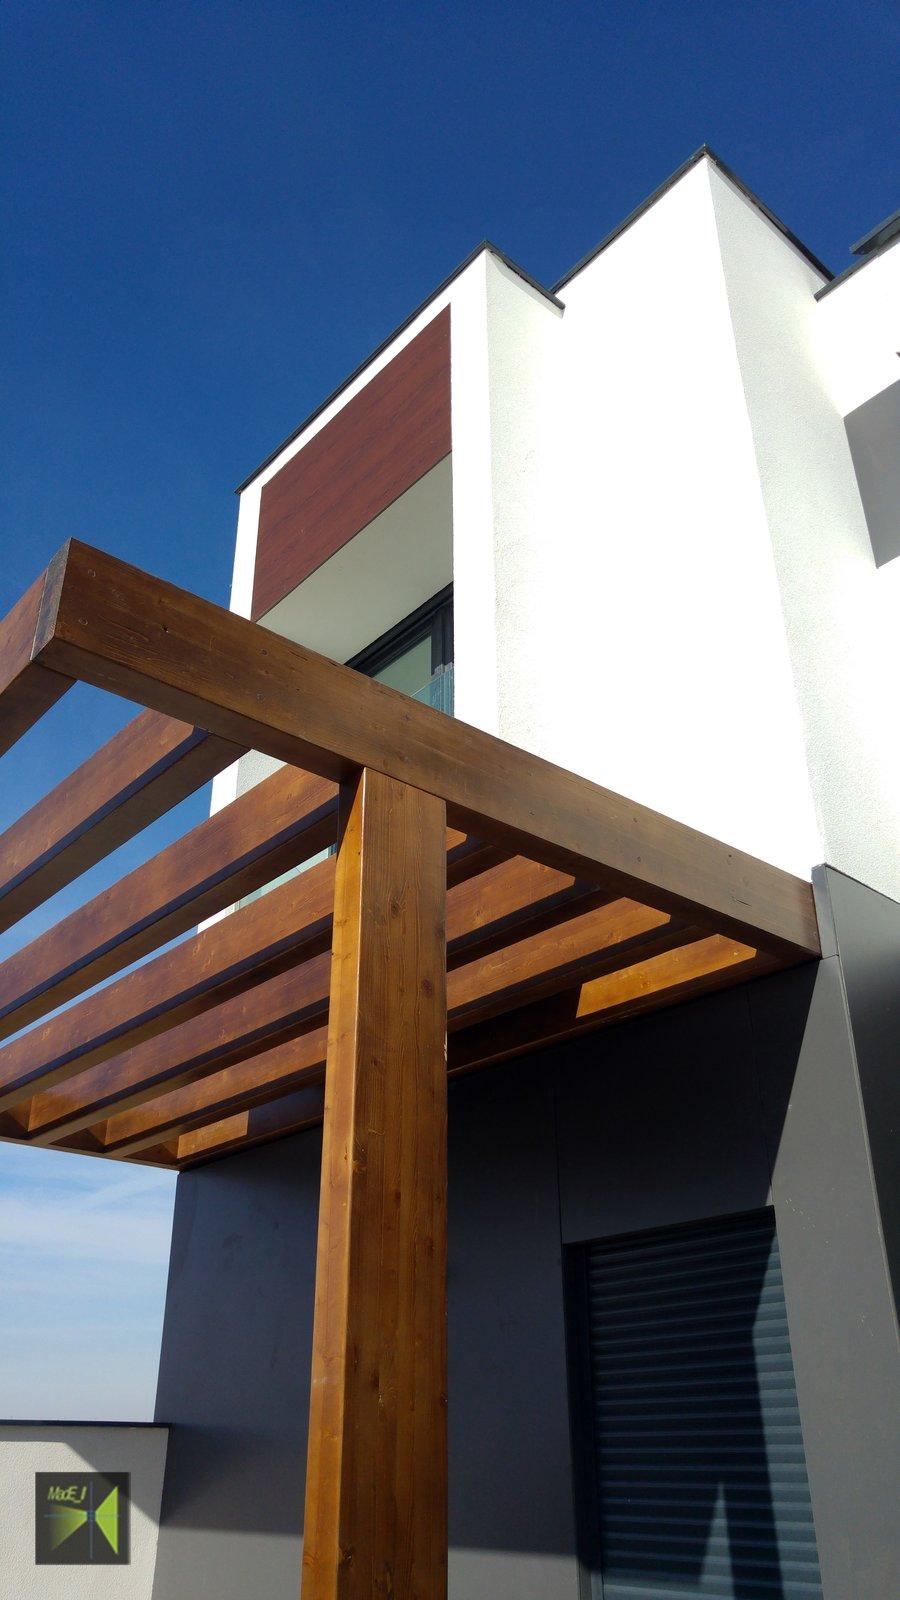 Pergola  Casa Herranz by Jose Enrique Leo Lopez